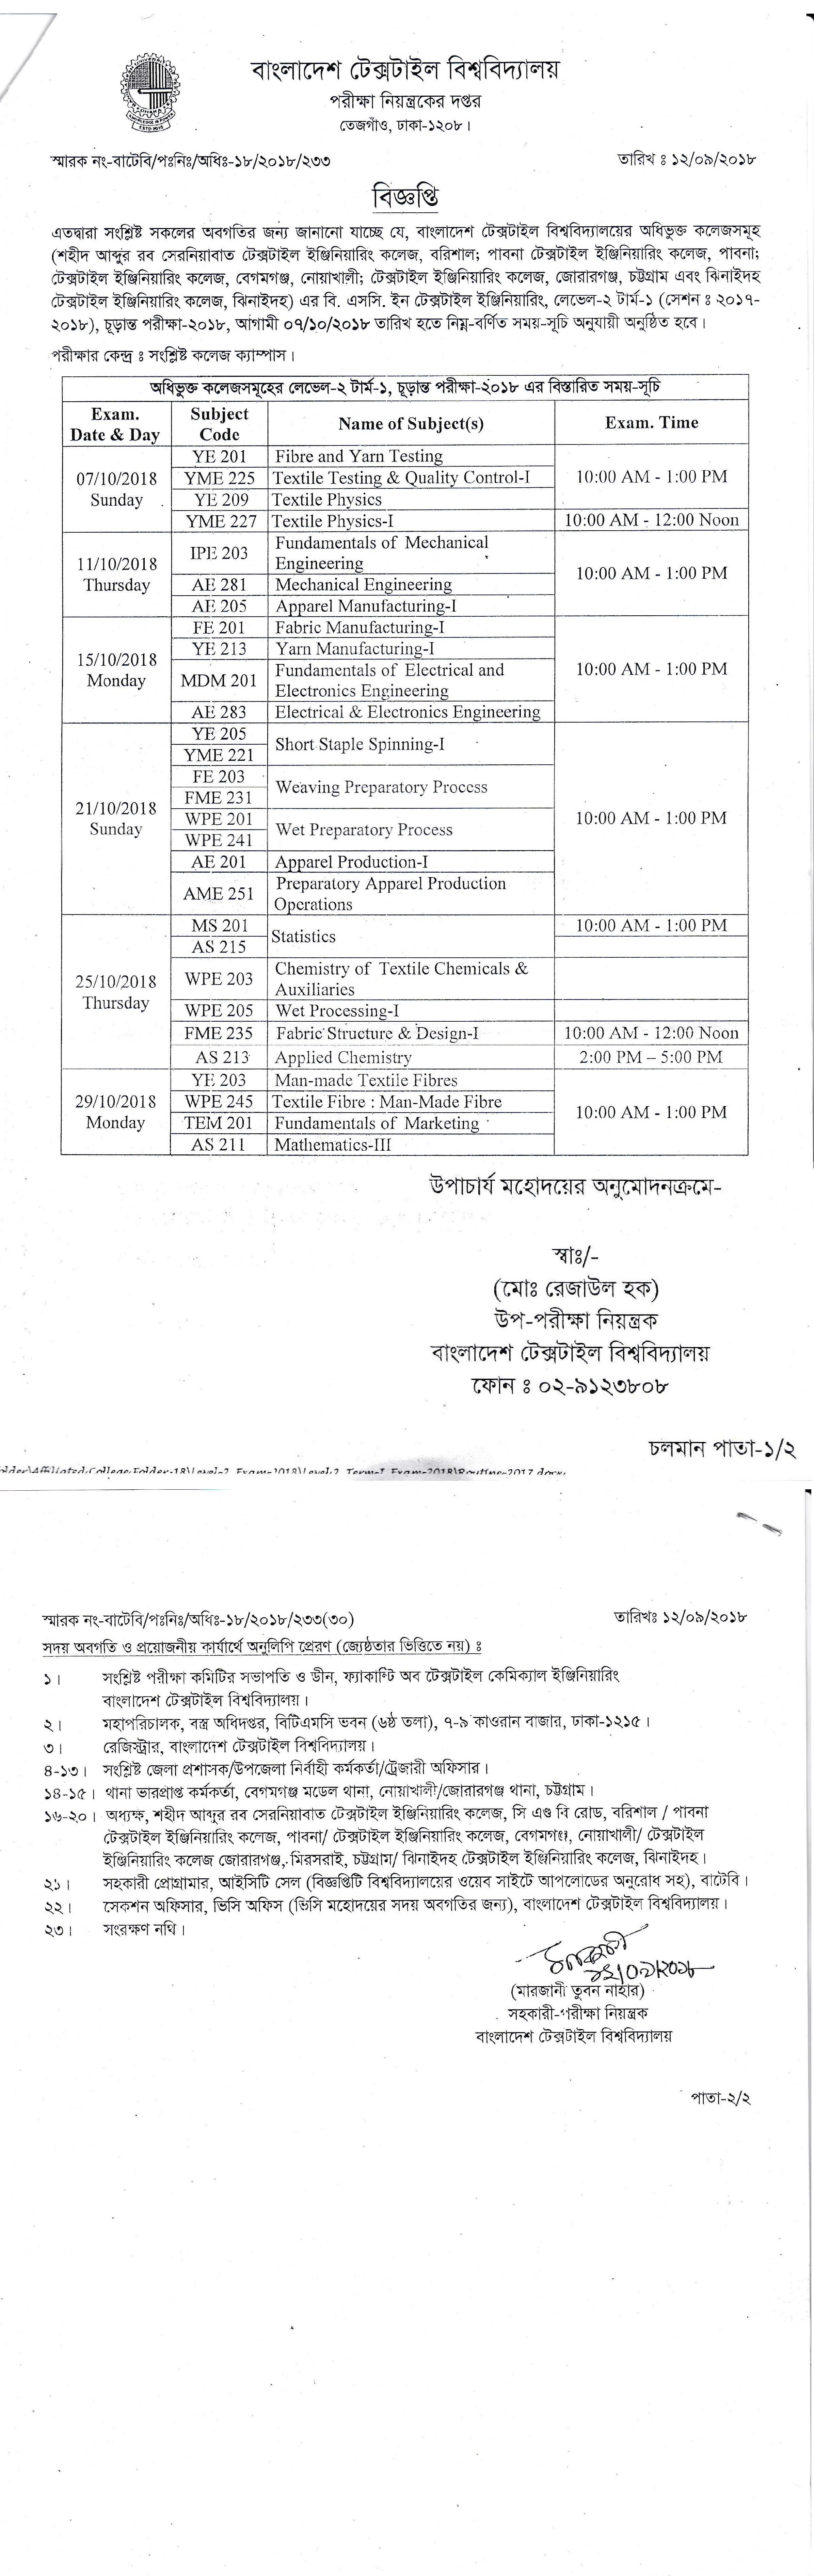 Exam Schedule of B.Sc. in Textile Engineering L-2 T-1 Exam-2018